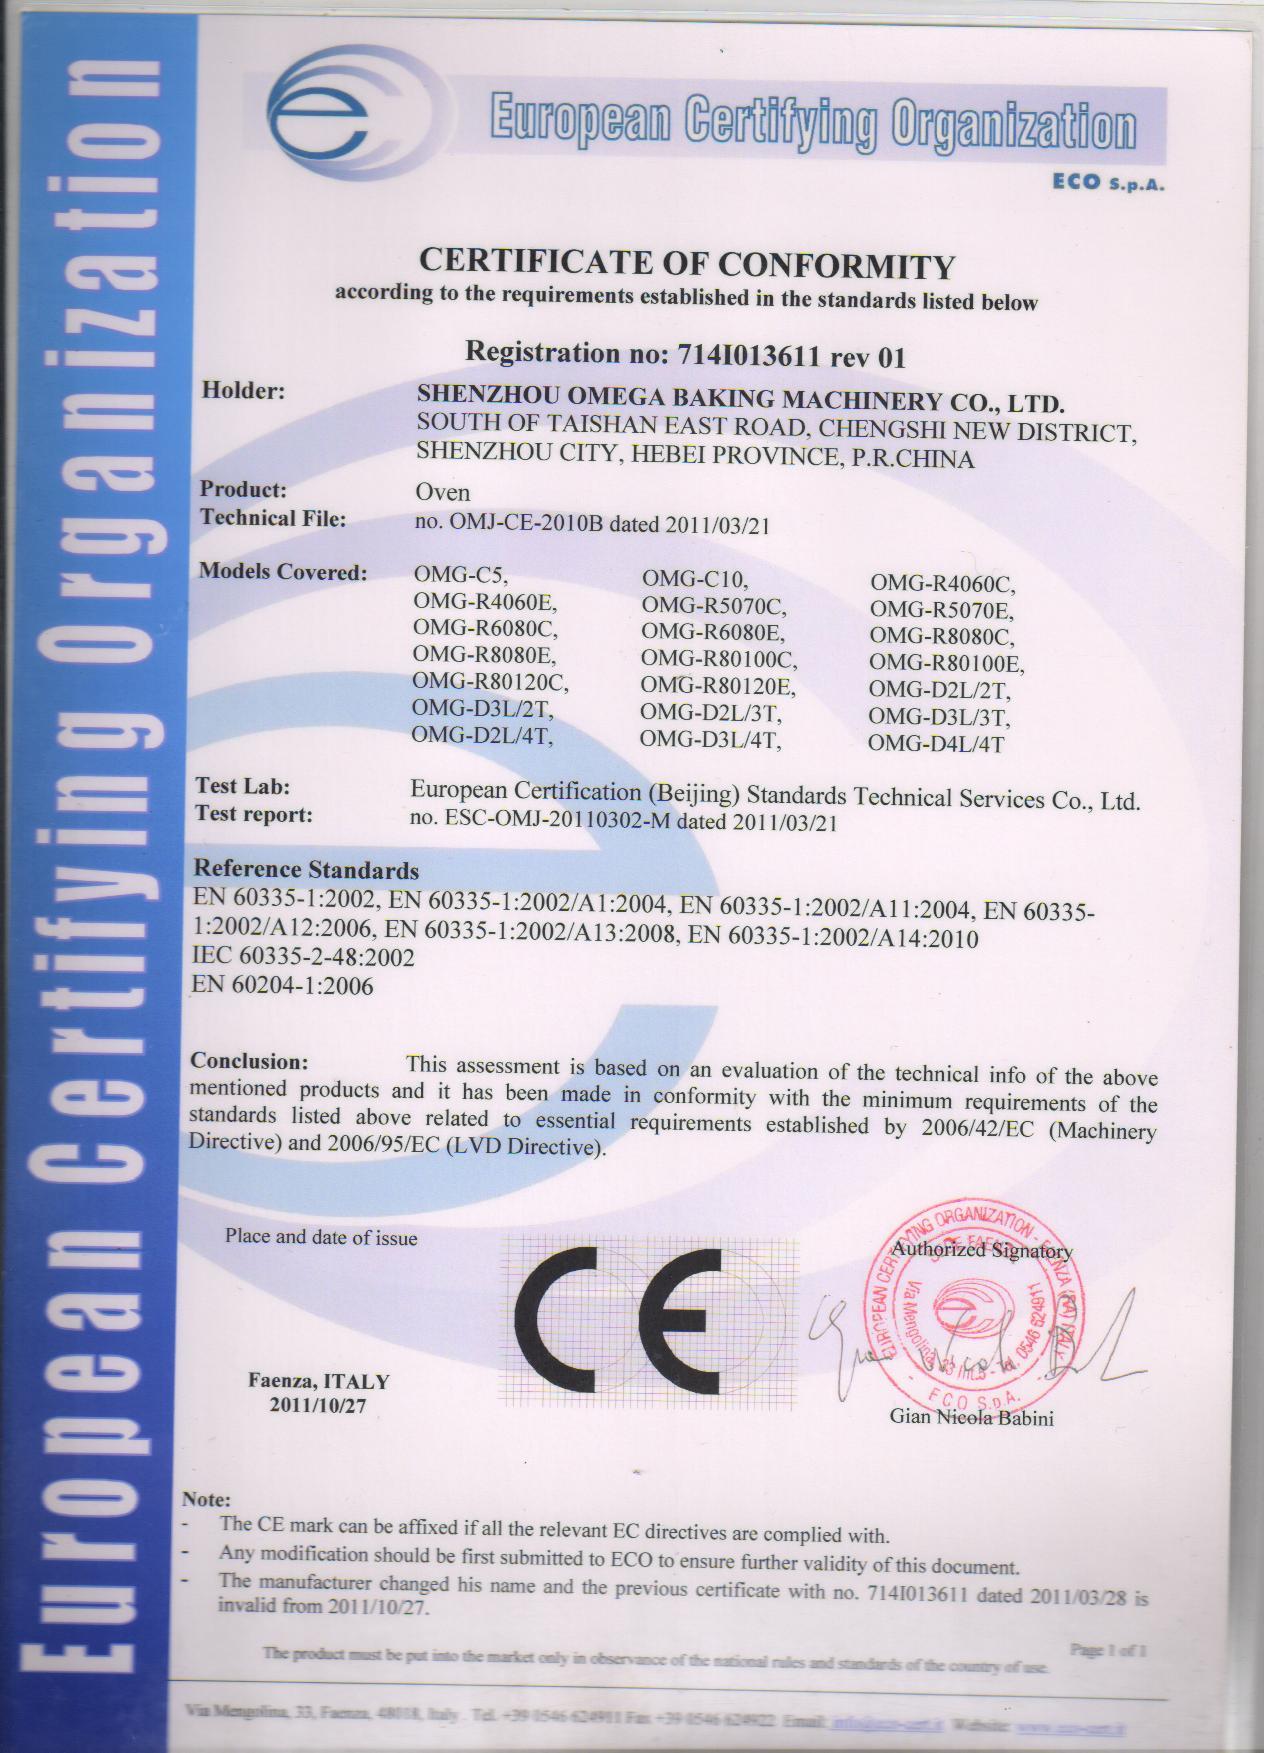 Oven Certificate